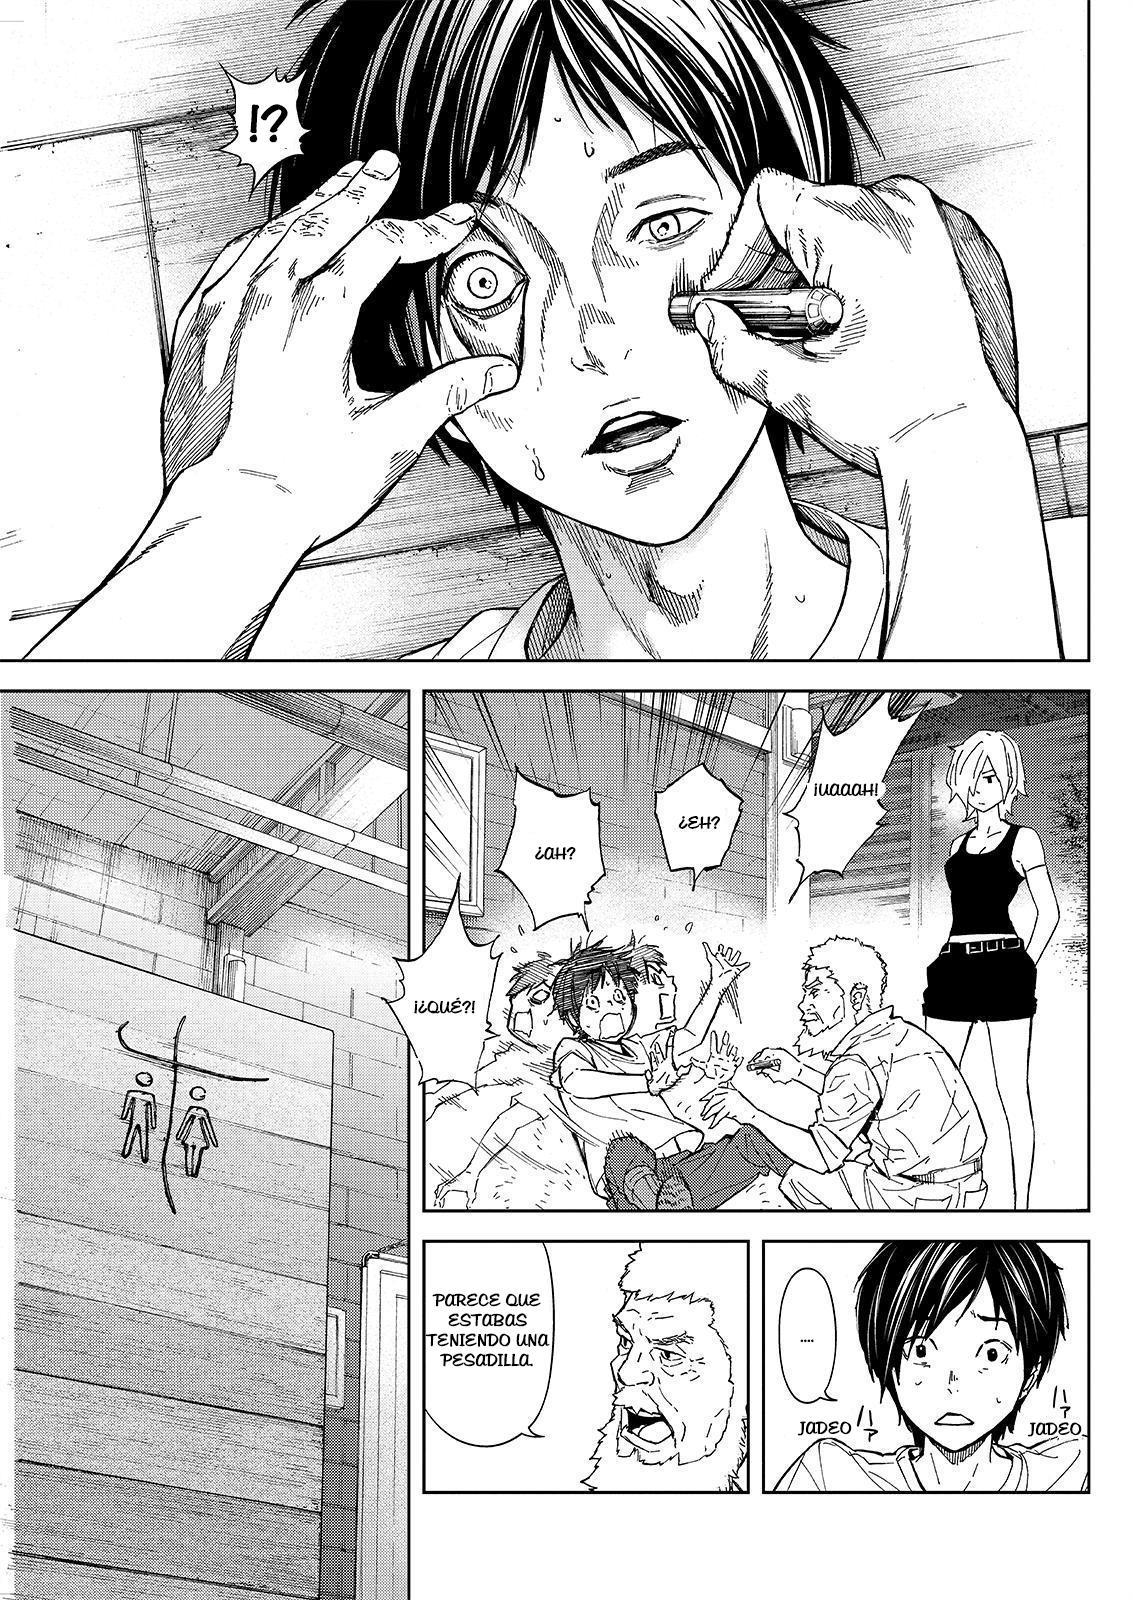 http://c5.ninemanga.com/es_manga/54/16310/423644/779146e5712cfe402503e06a5184bd69.jpg Page 10